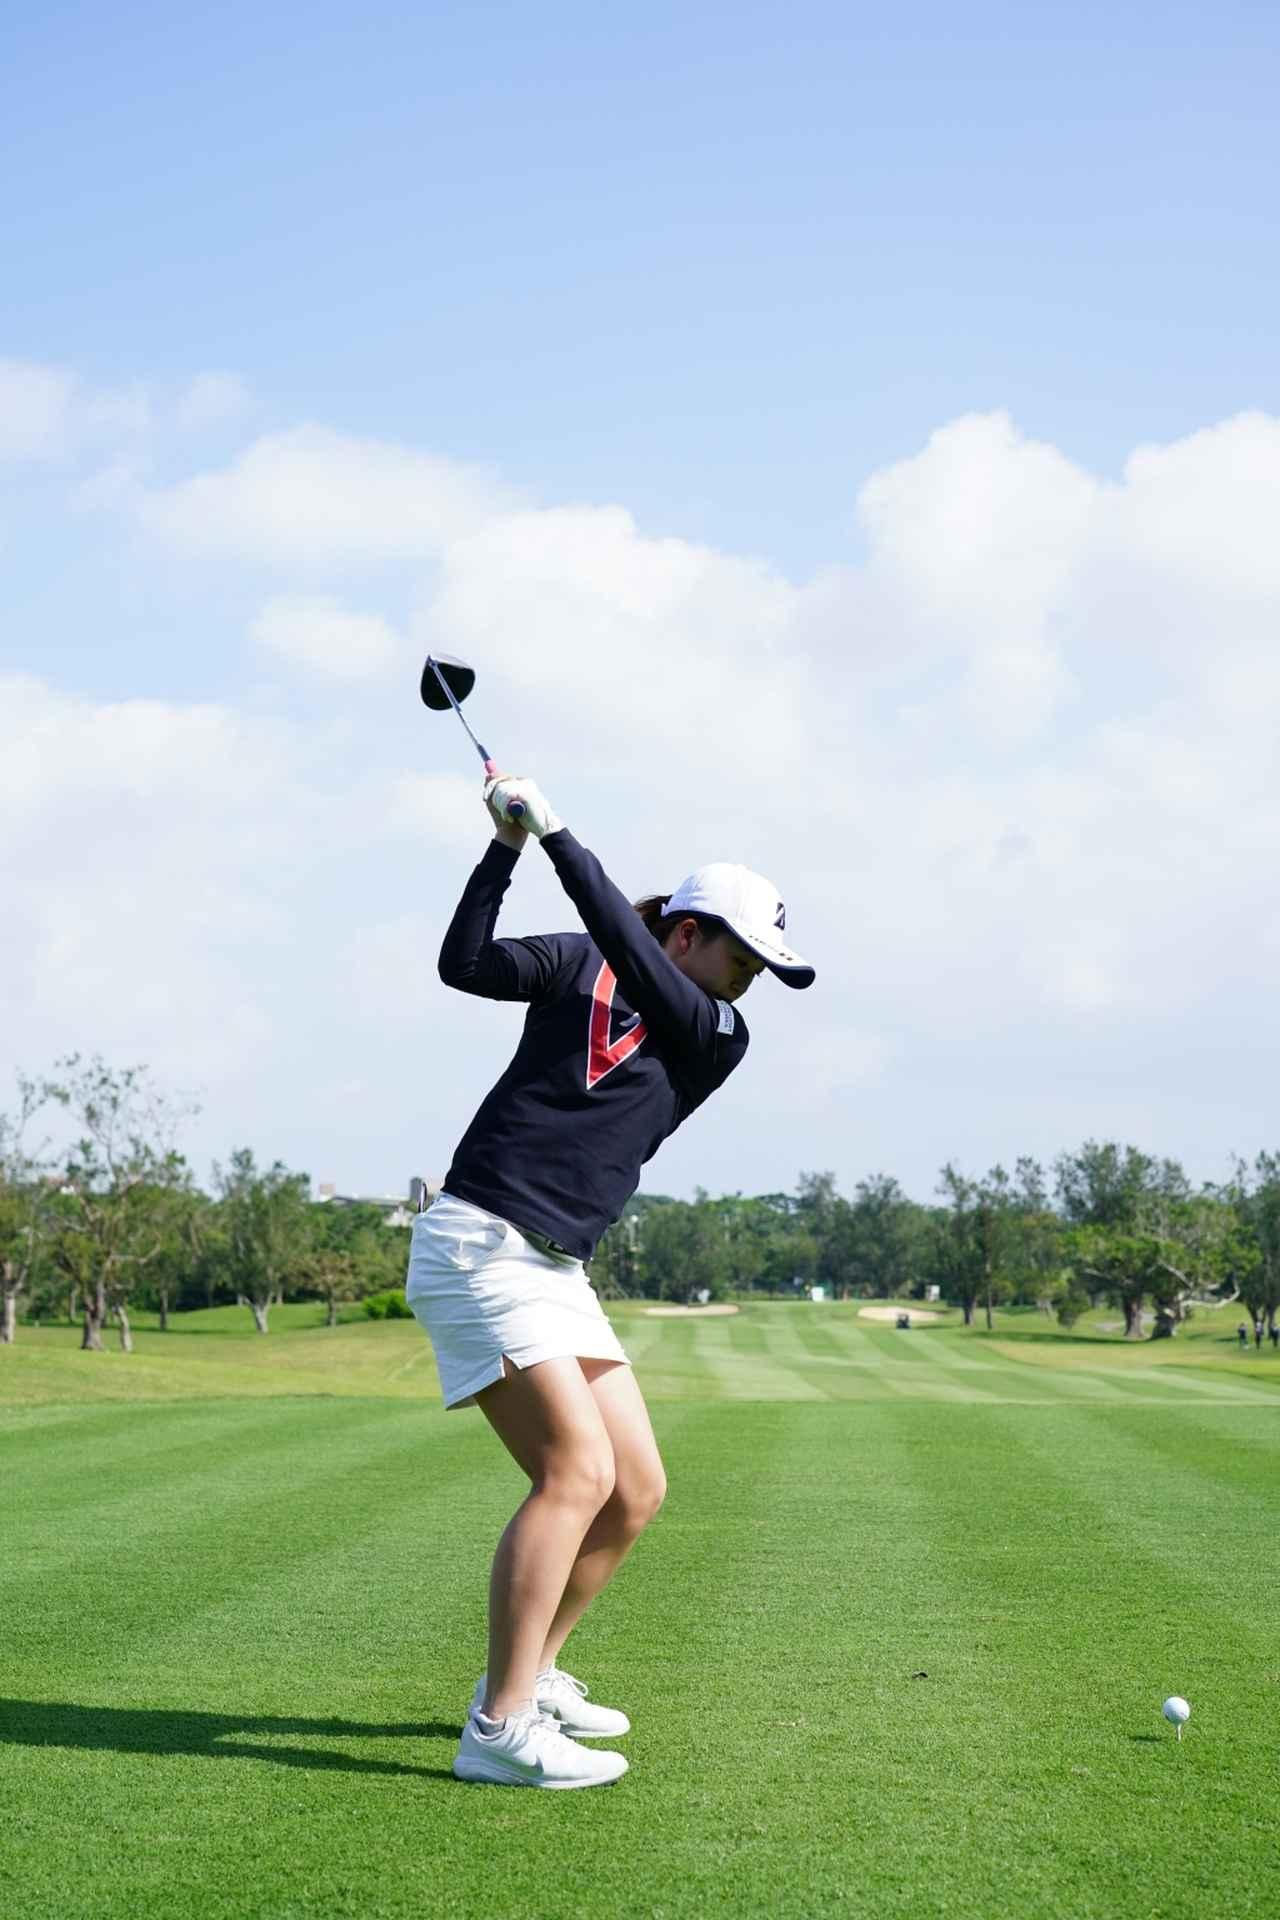 Images : 10番目の画像 - 丹萌乃のドライバー連続写真 - みんなのゴルフダイジェスト